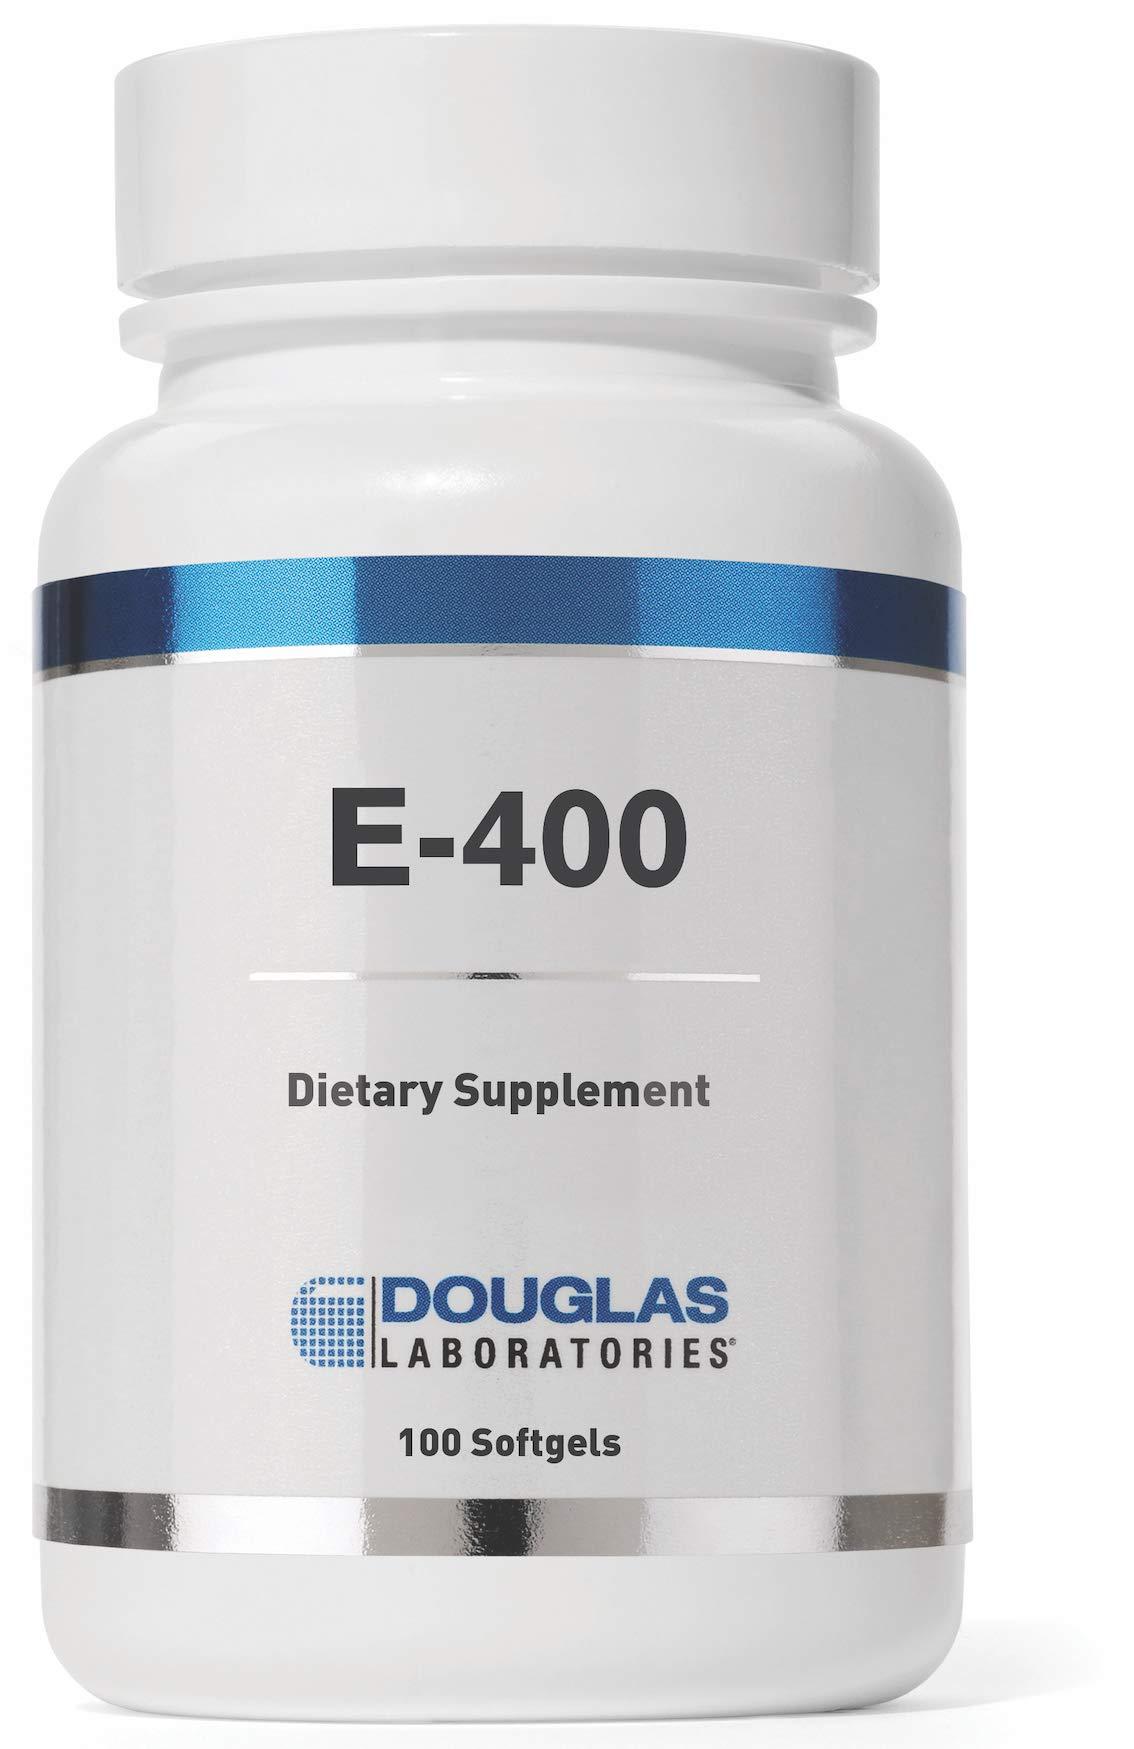 Douglas Laboratories - E-400 - Vitamin E for Antioxidant Protection and Cardiovascular Support - 100 Capsules